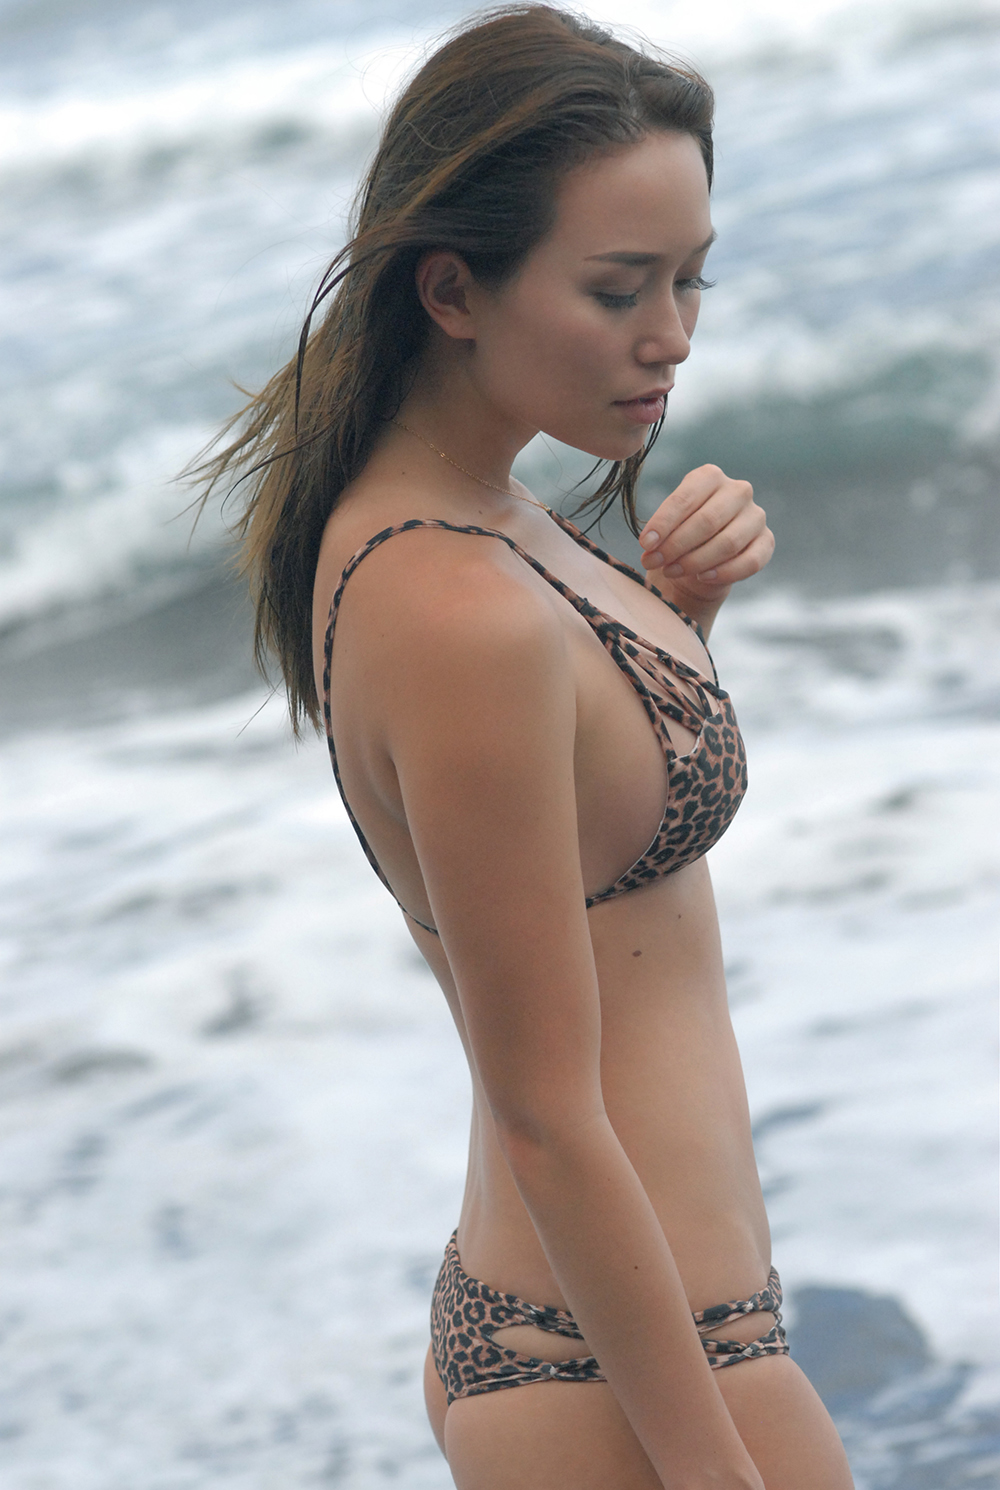 Swimbook_swimsuit_Acacia_Marlie_Hinshaw_DSC_0316.JPG